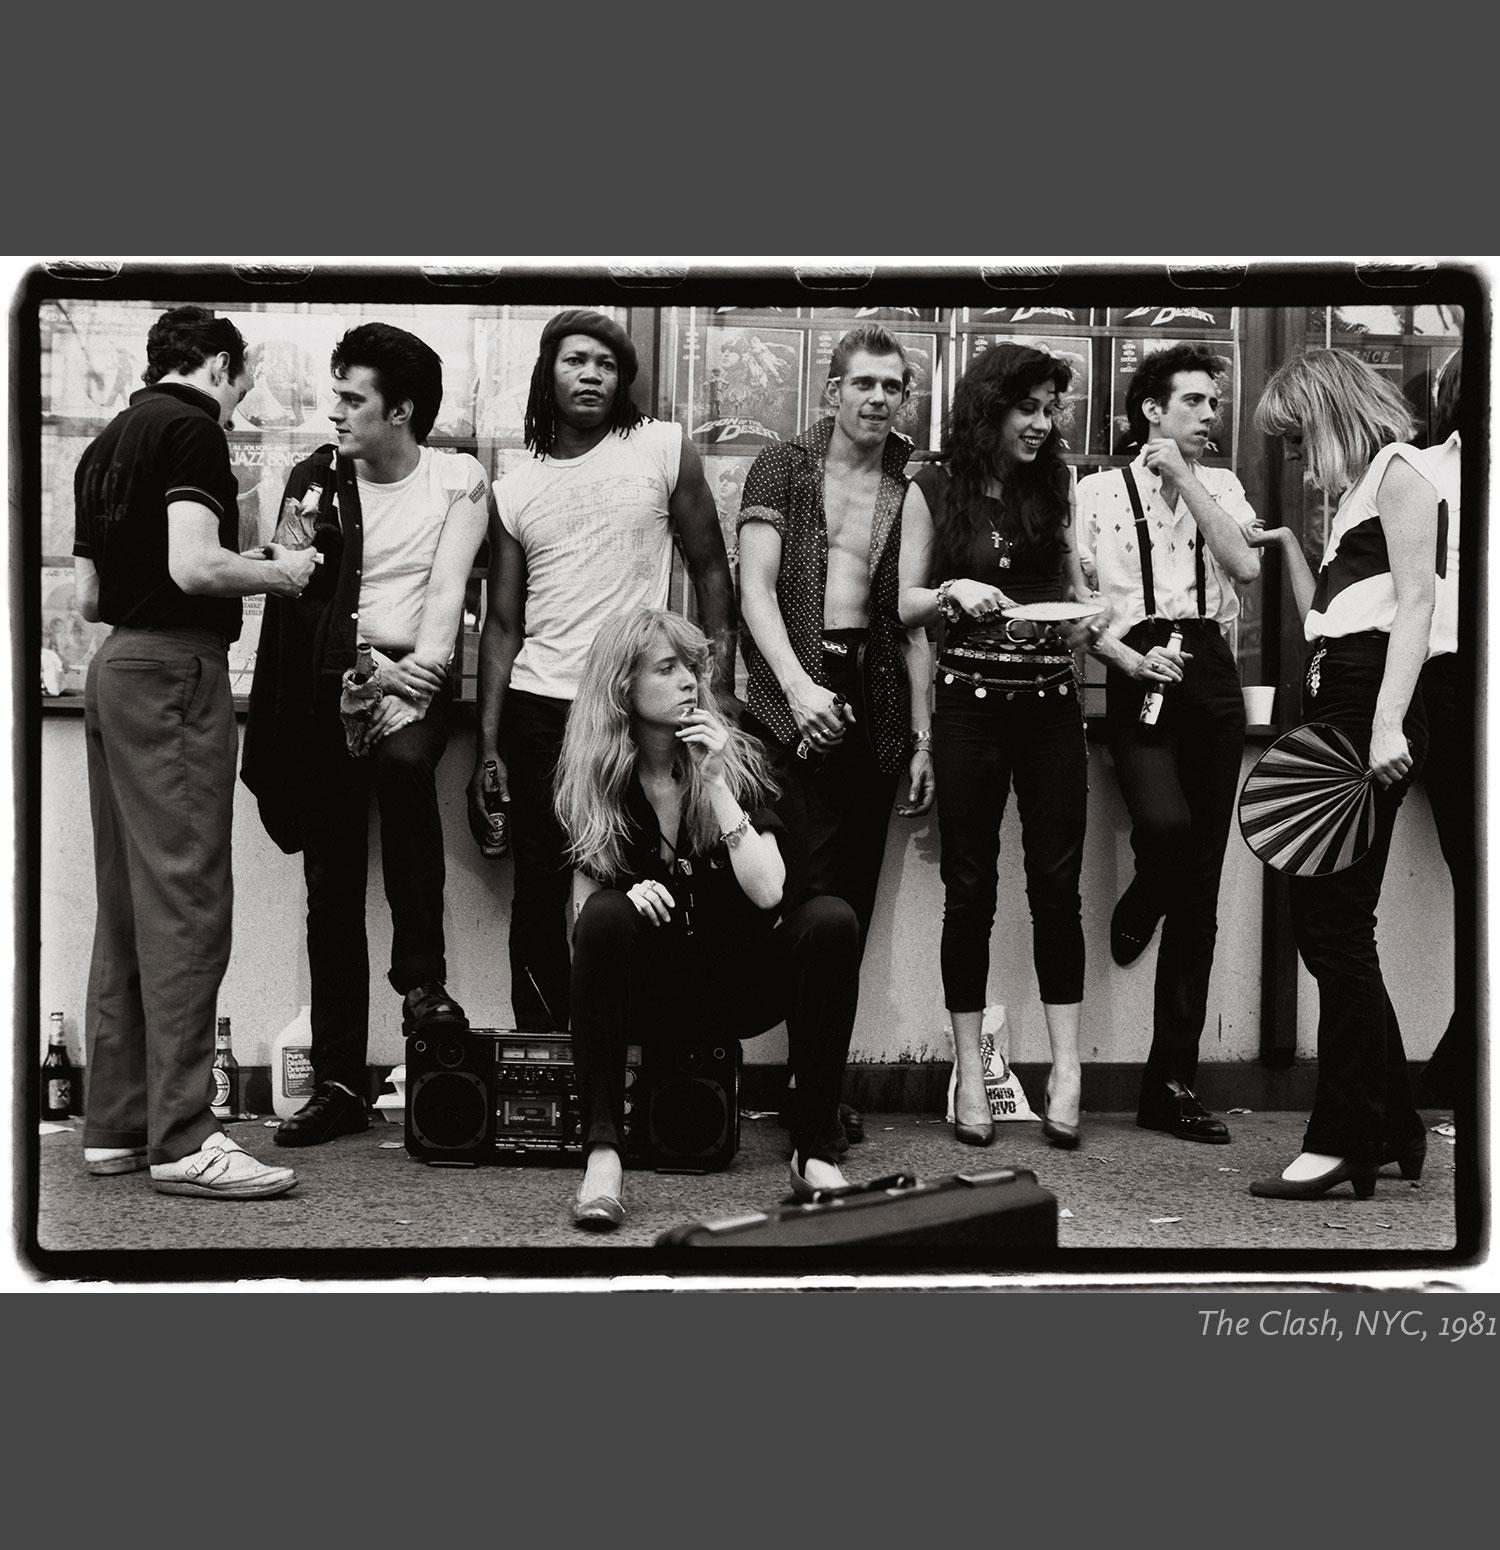 1_The-Clash,-NYC-,1981.jpg